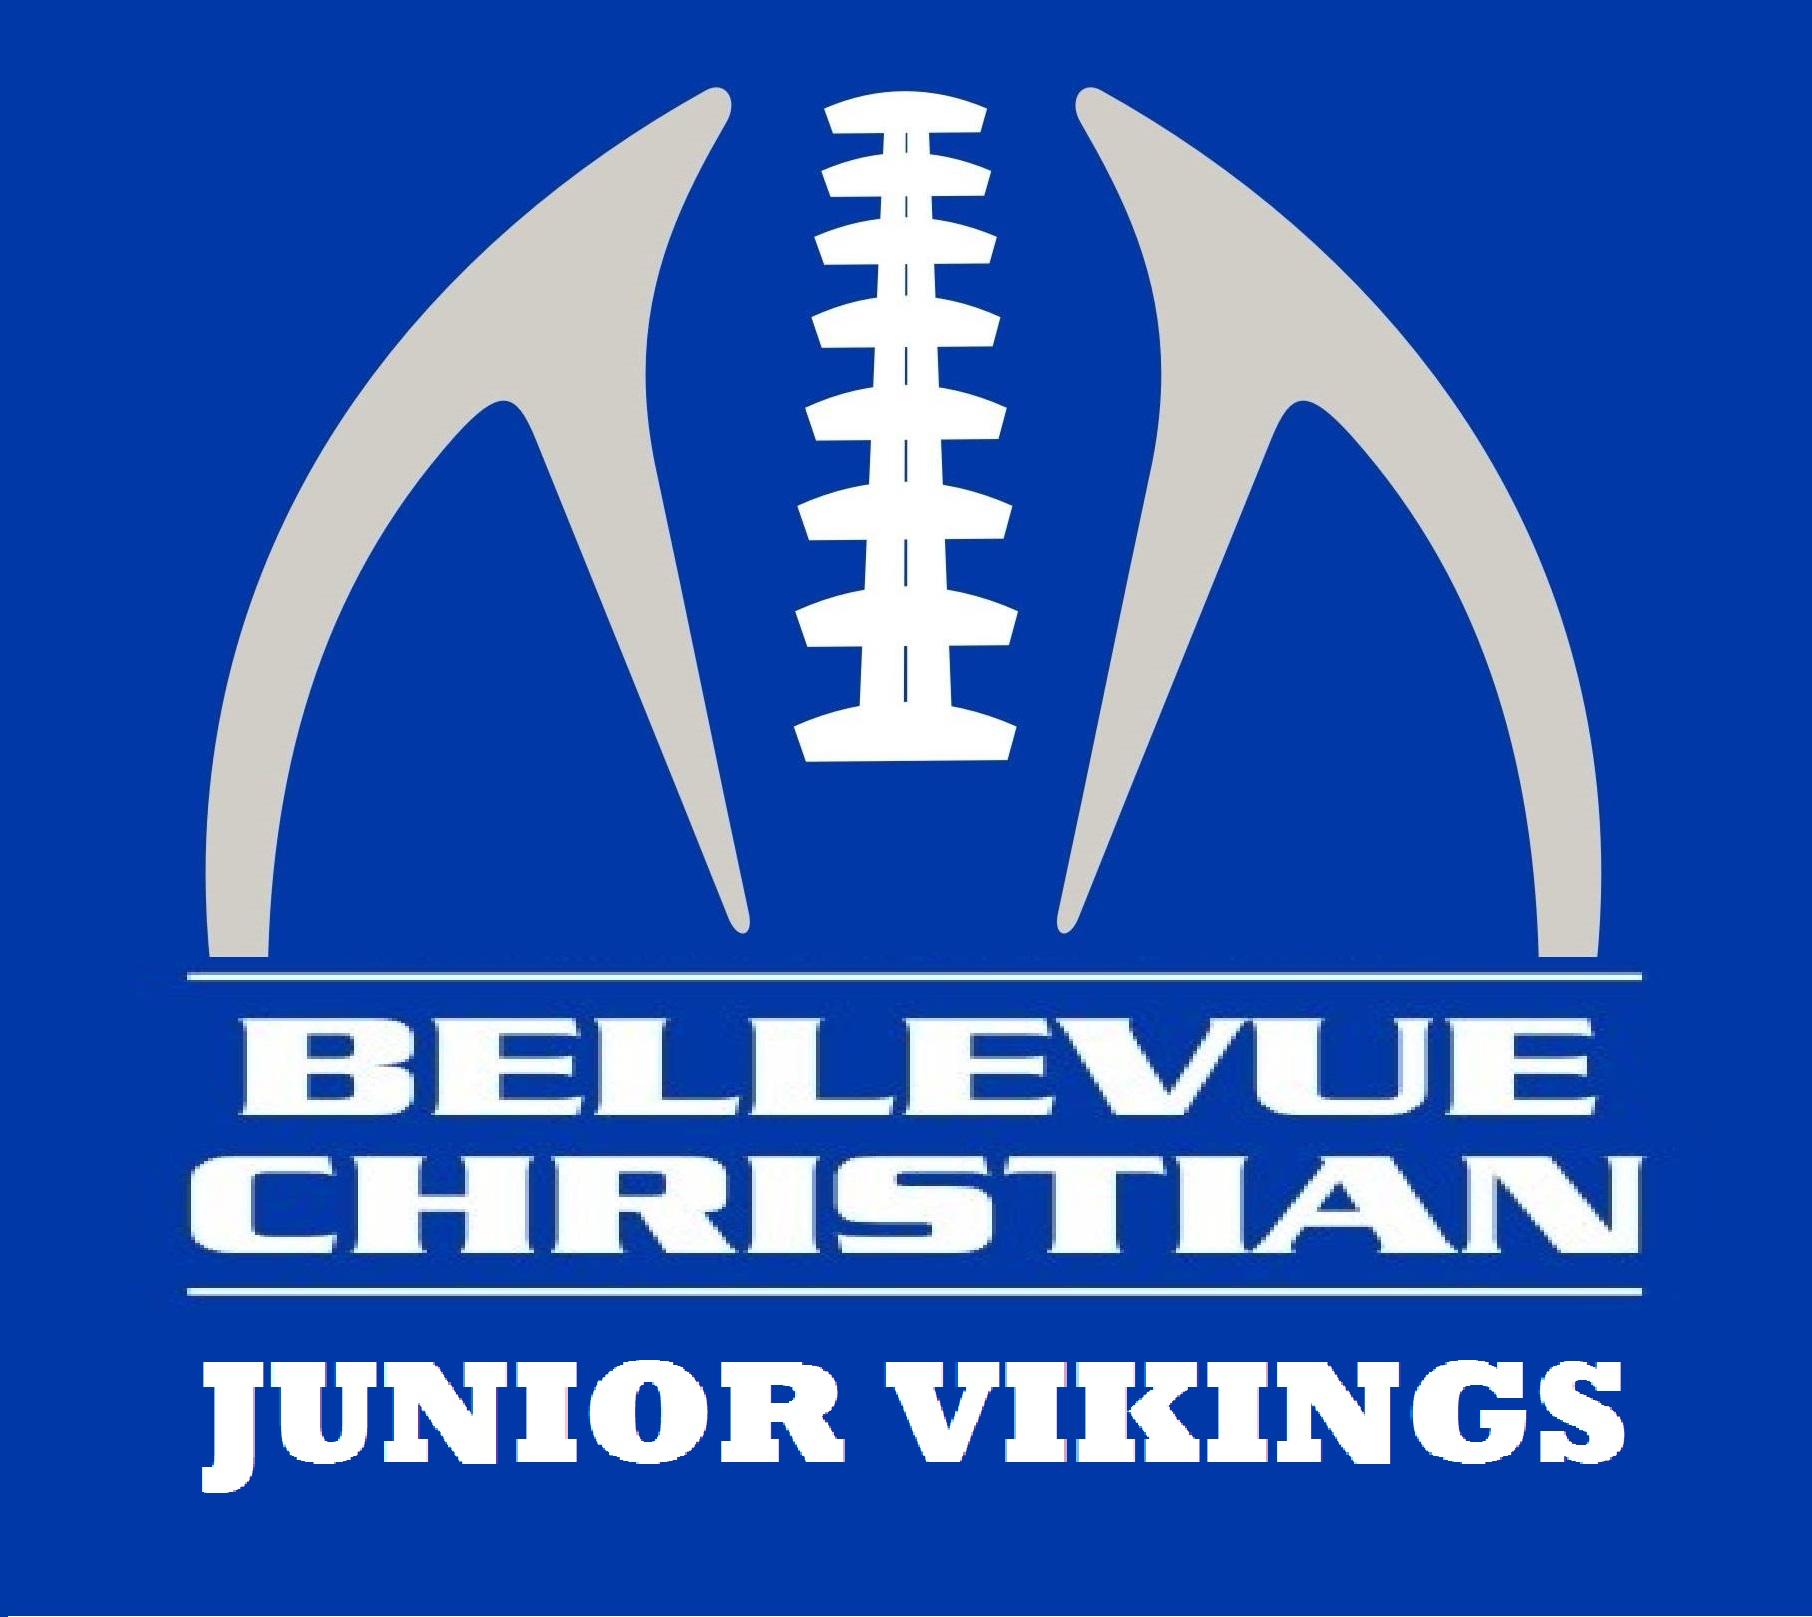 Bellevue Christian Jr. Vikings